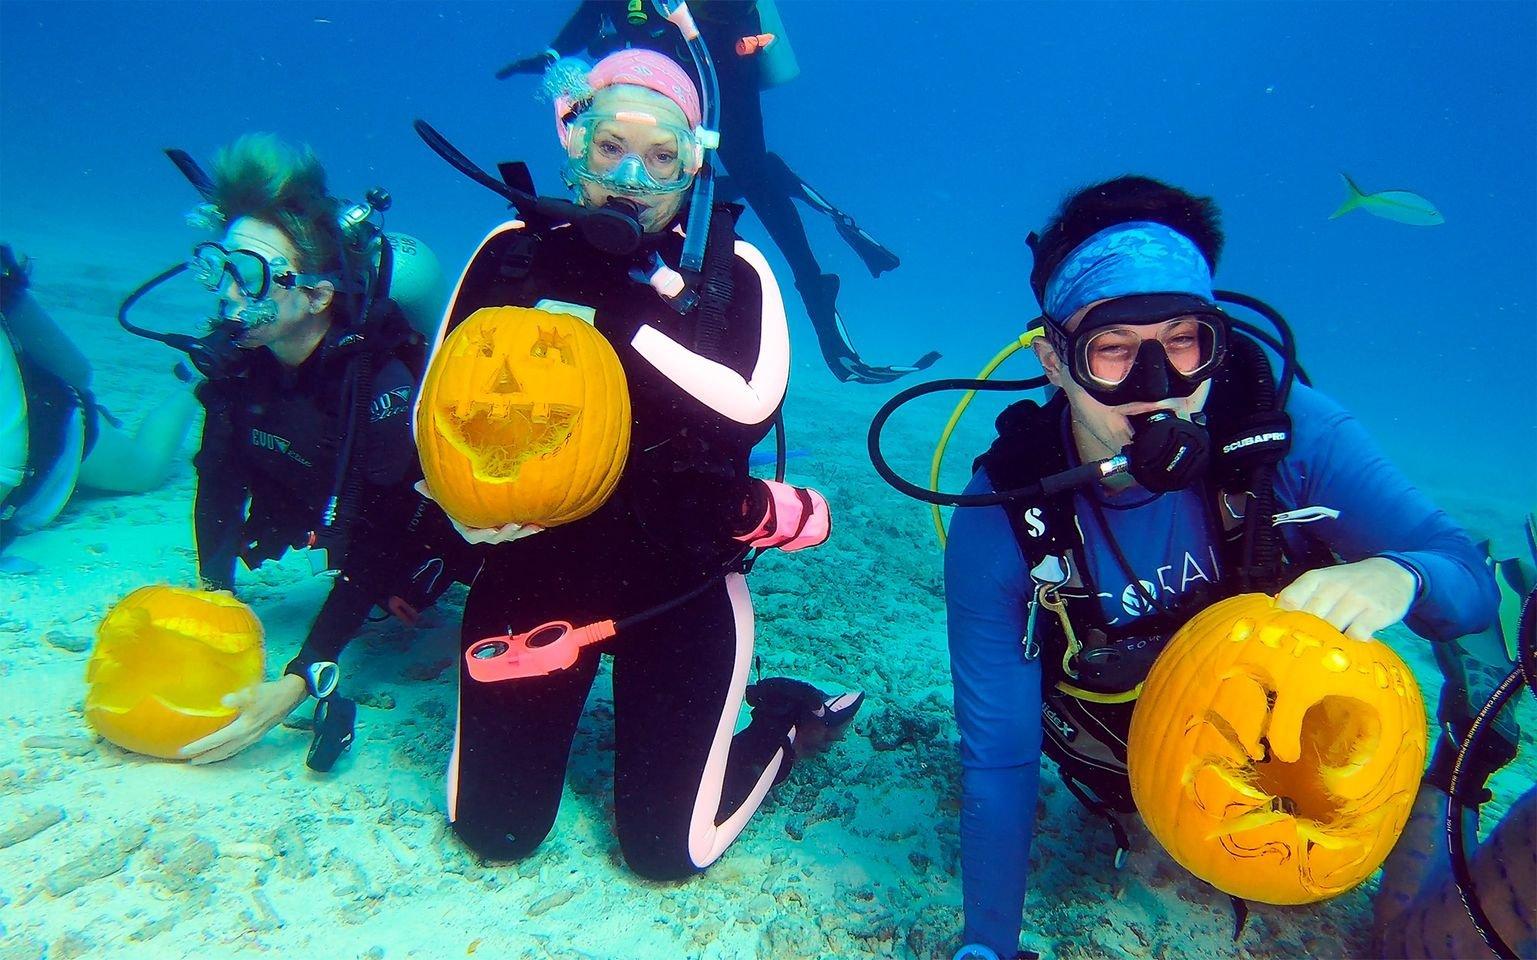 Underwater Pumpkin Carving Contest at Lake Denton - 10/23/21